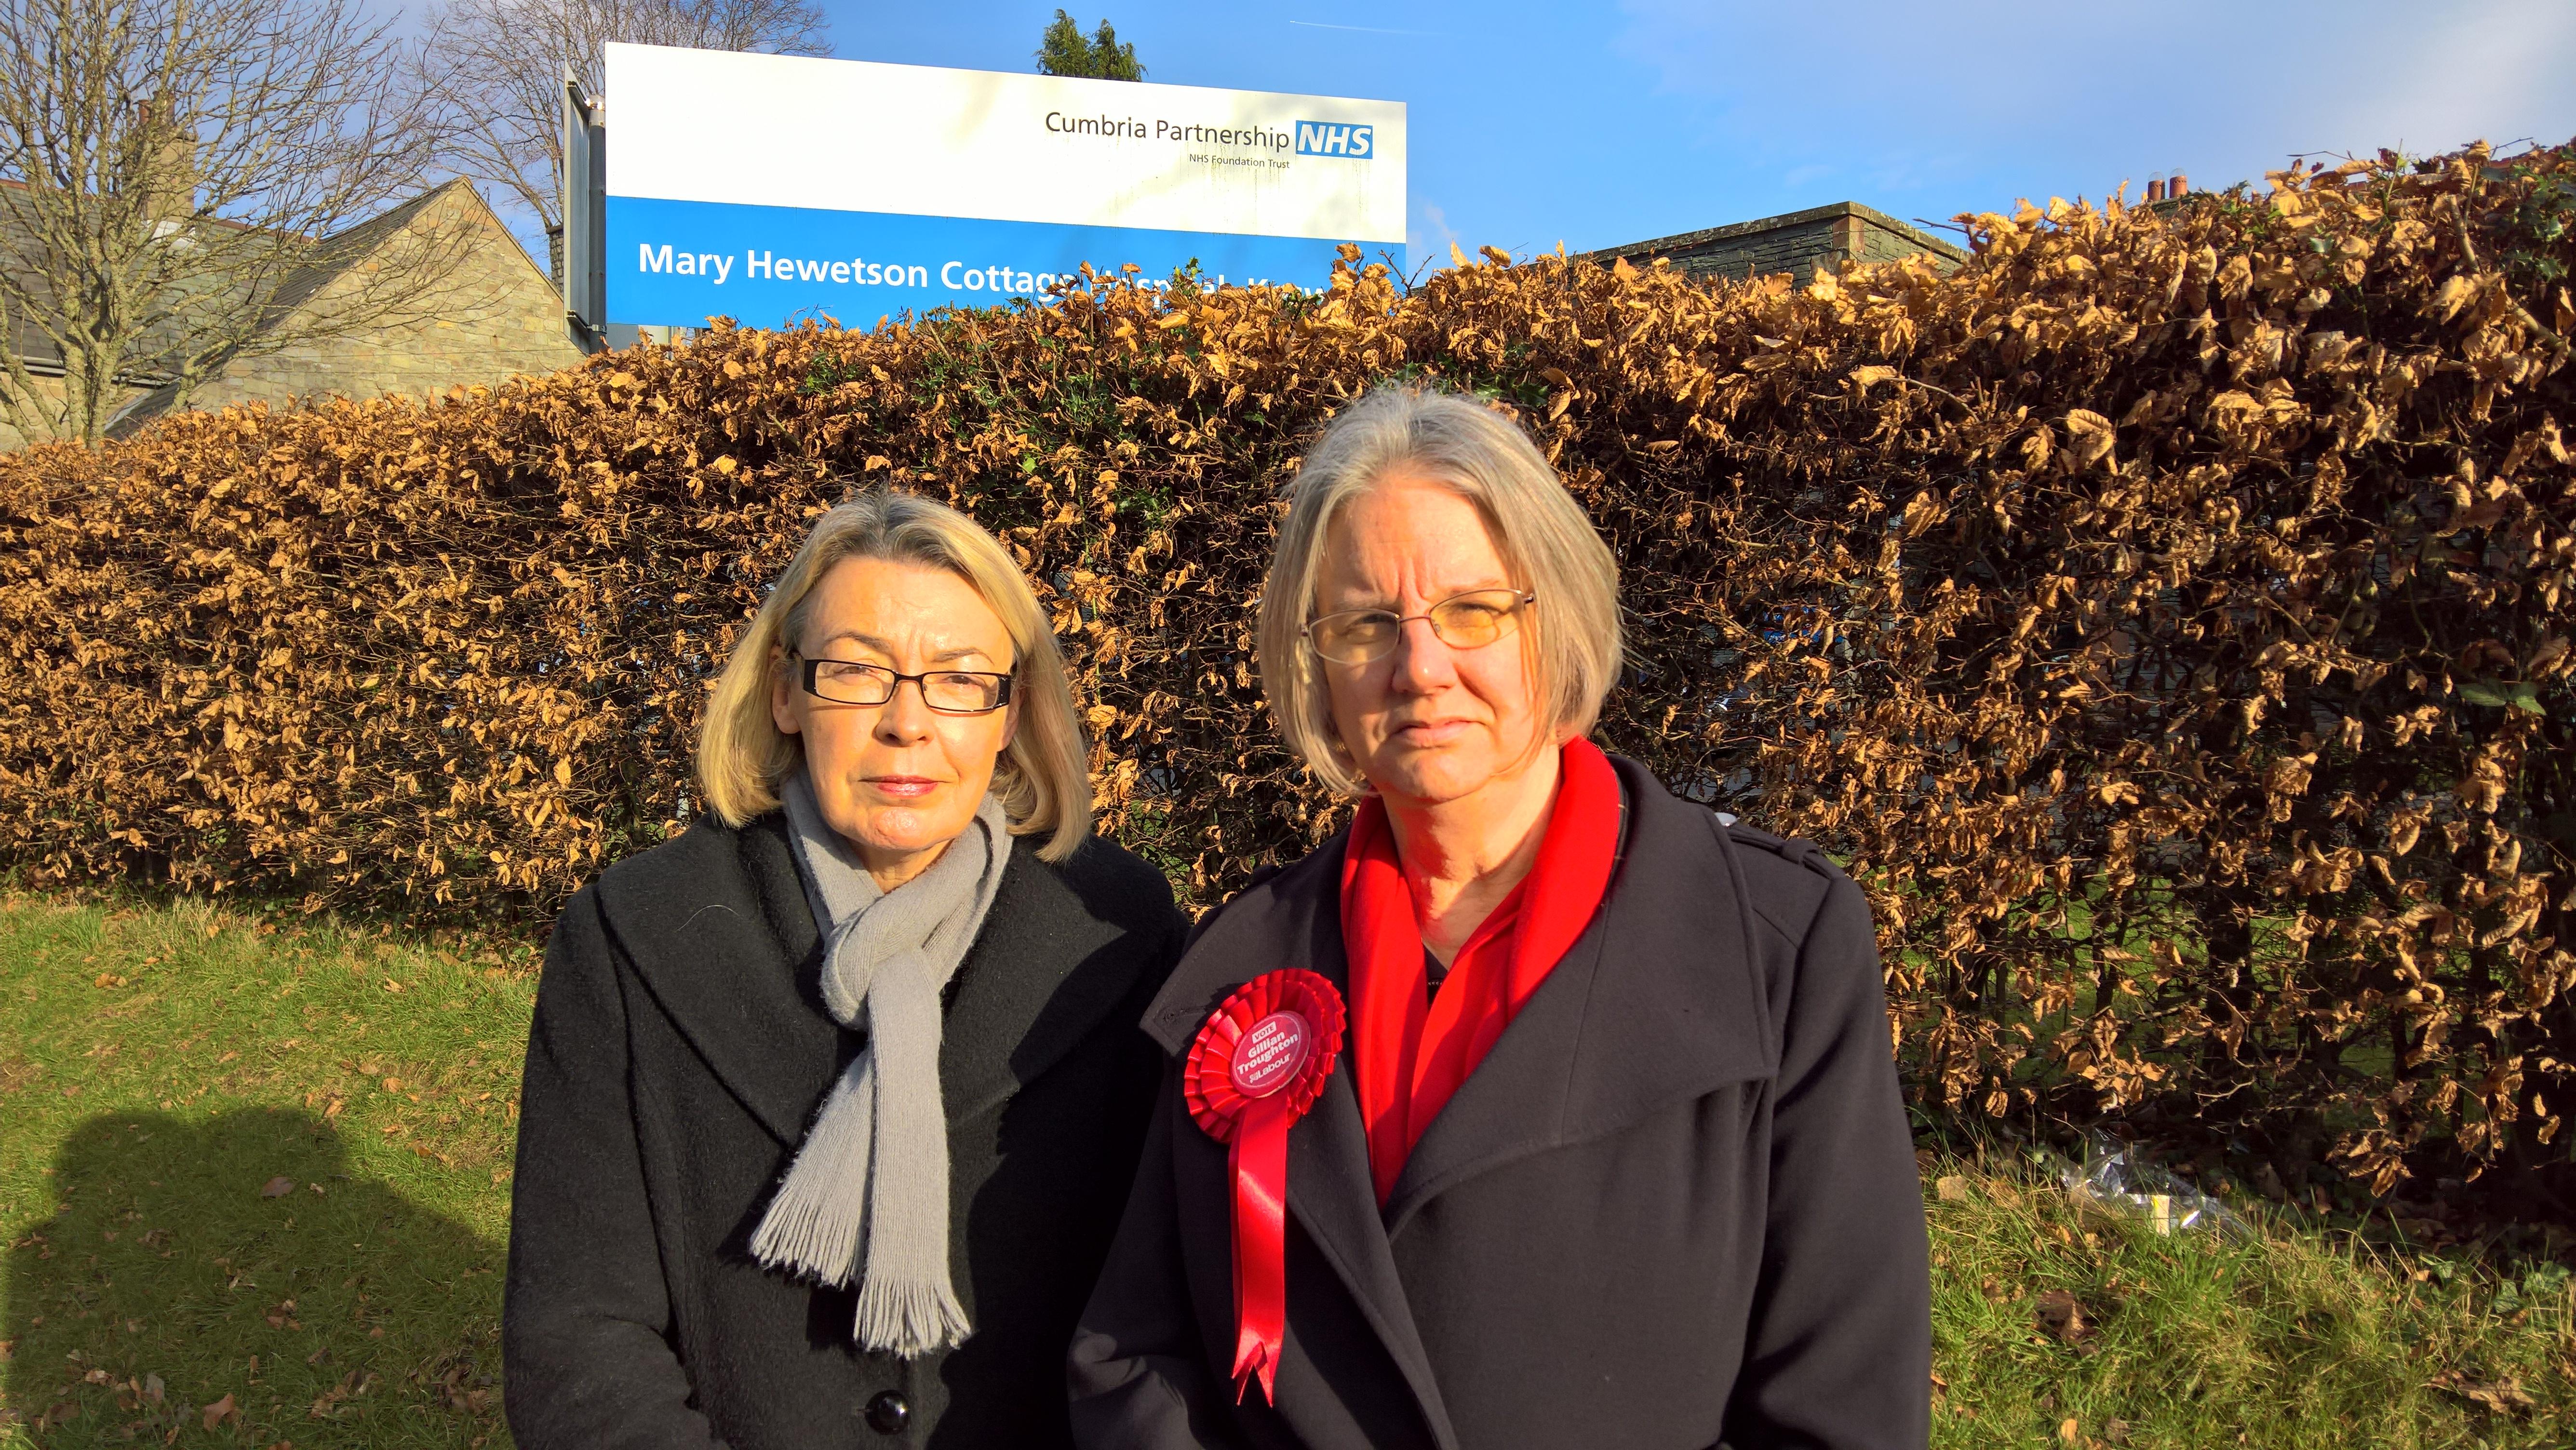 Barbara_and_Gillian_Keswick_Hospital.jpg